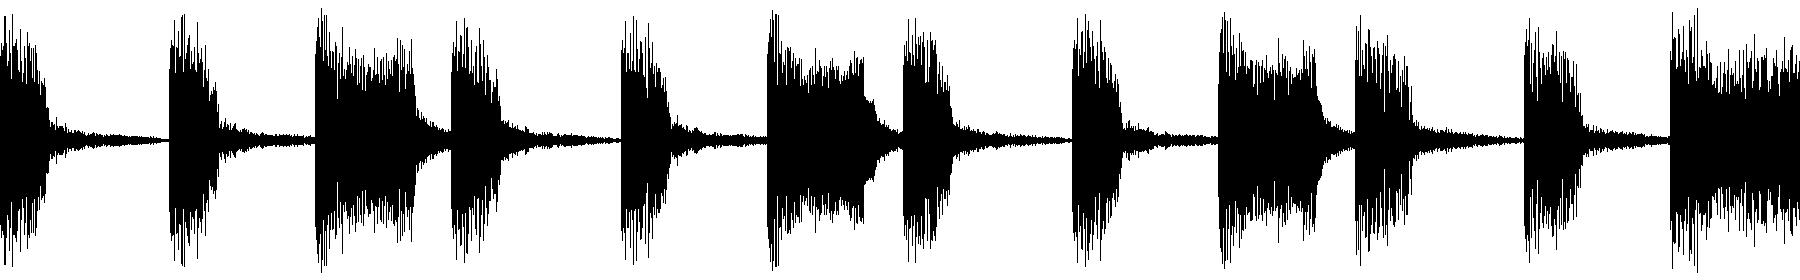 vedh melodyloop 031 bm7 9 em7 9 am7 9 124bpm